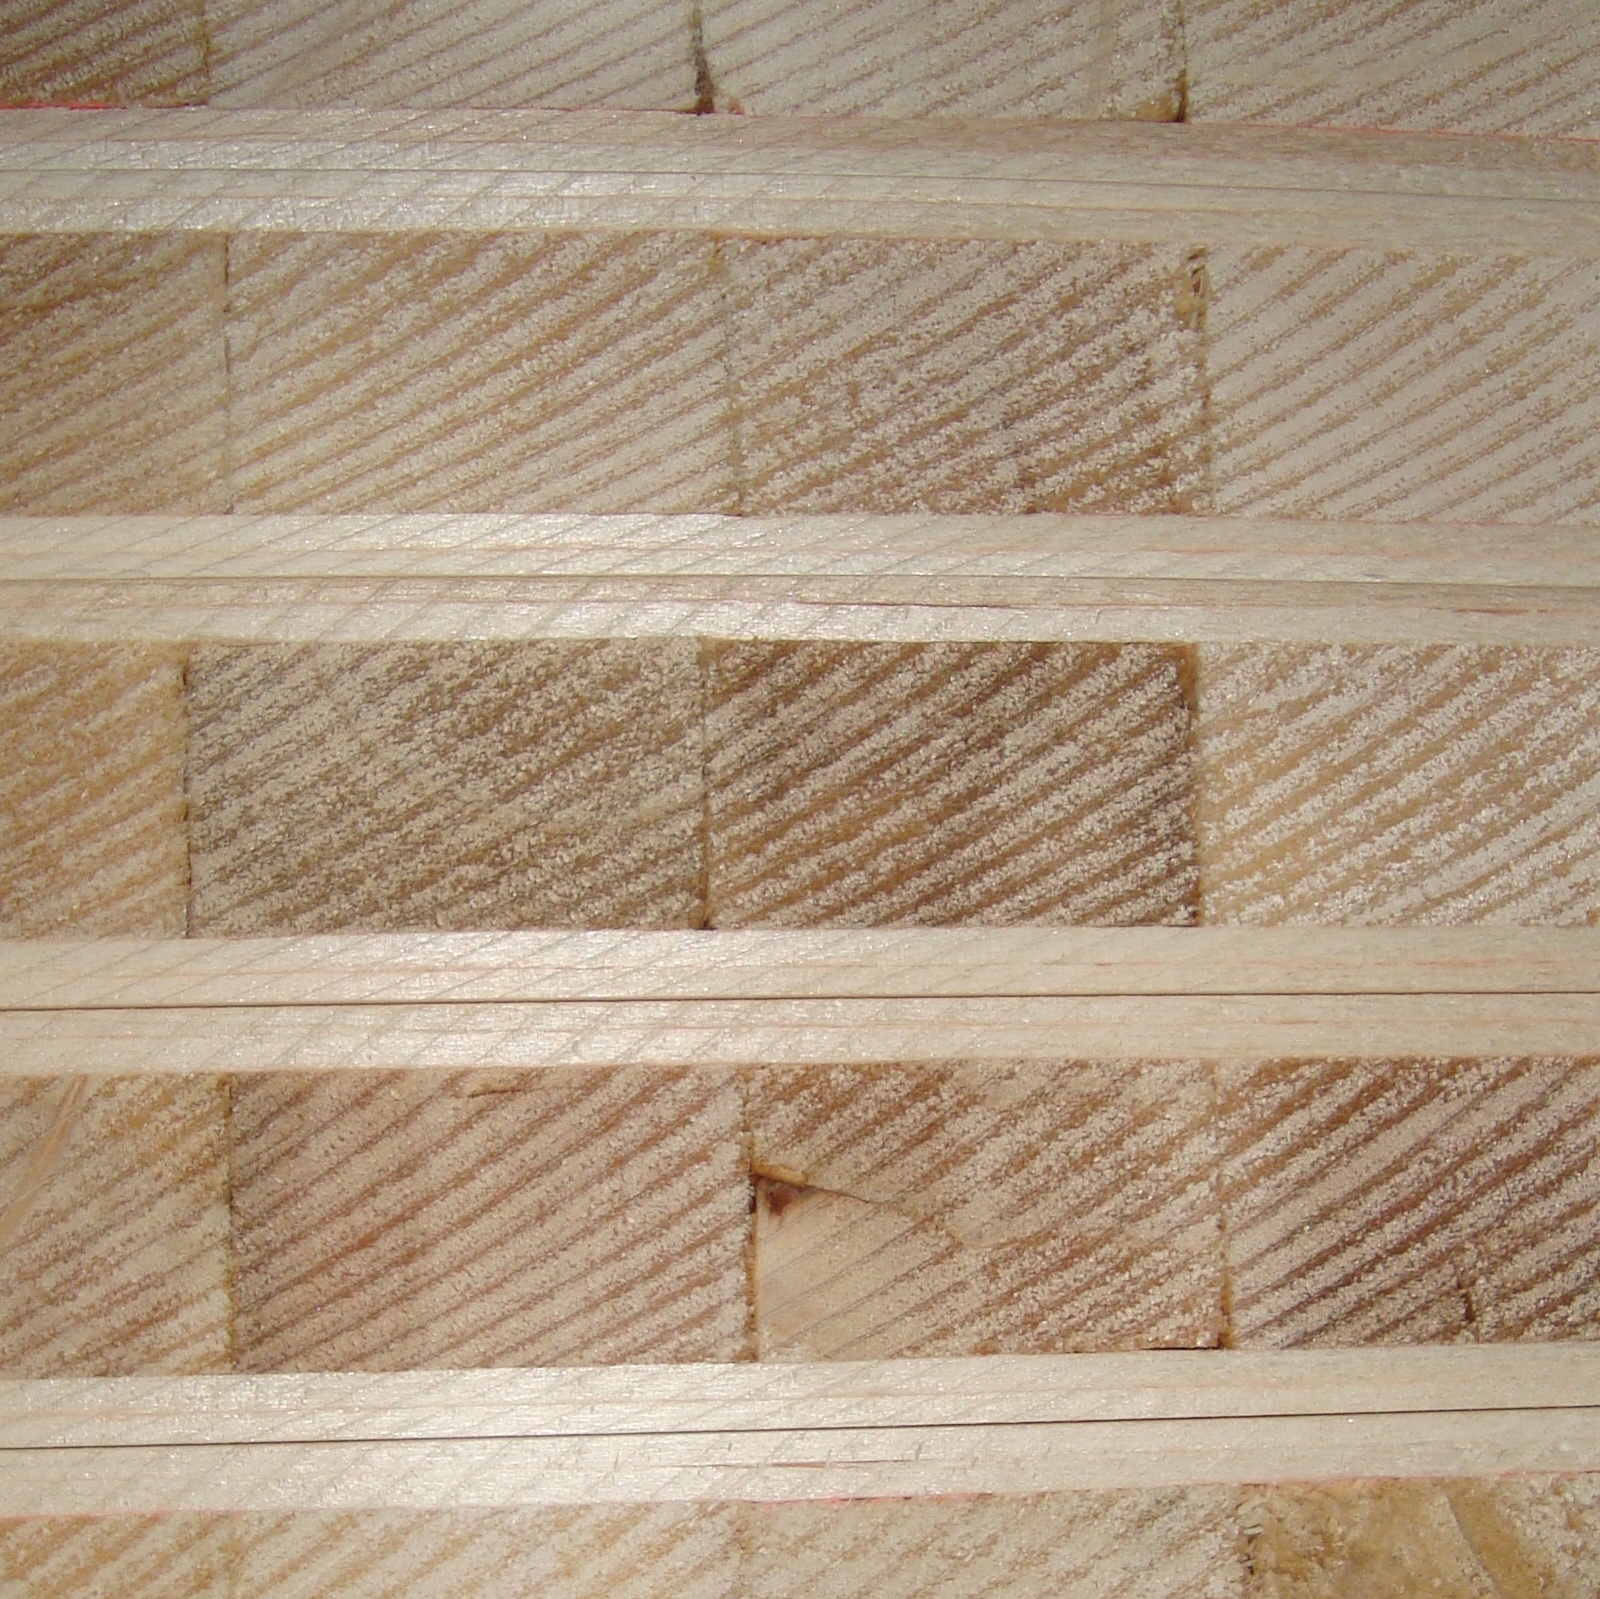 5 ply Poplar Lumber Core